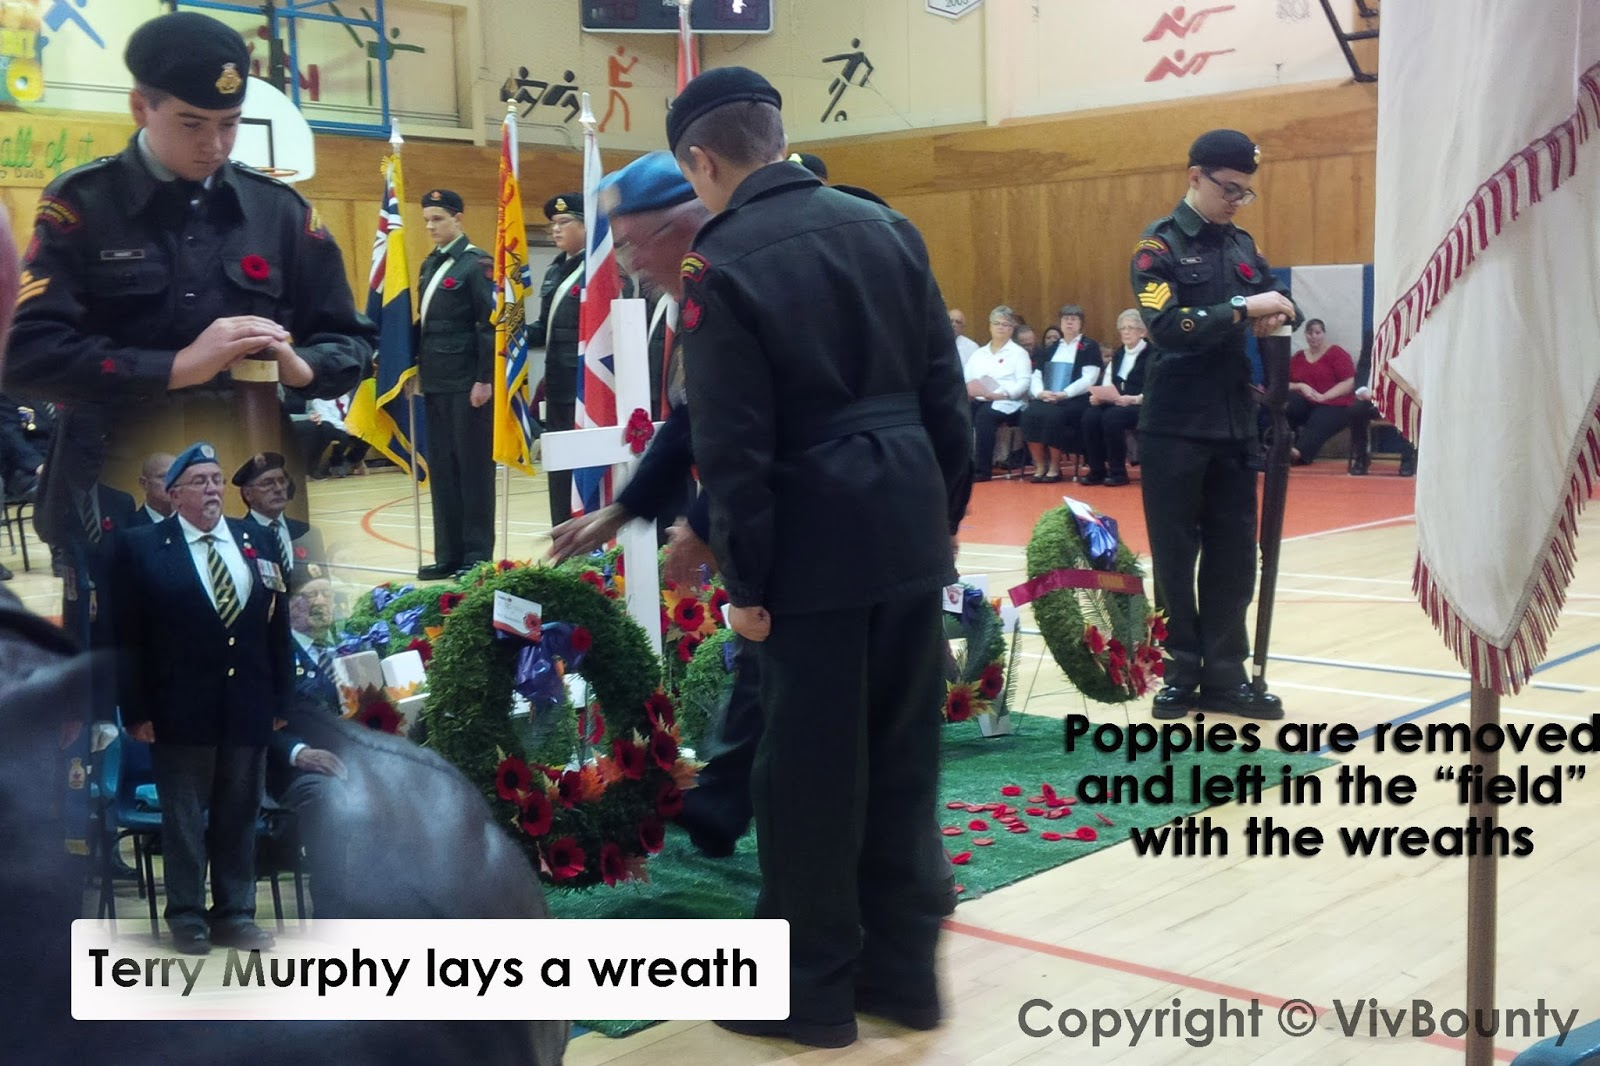 Terry Murphy, veteran lays a wreath, VivBounty